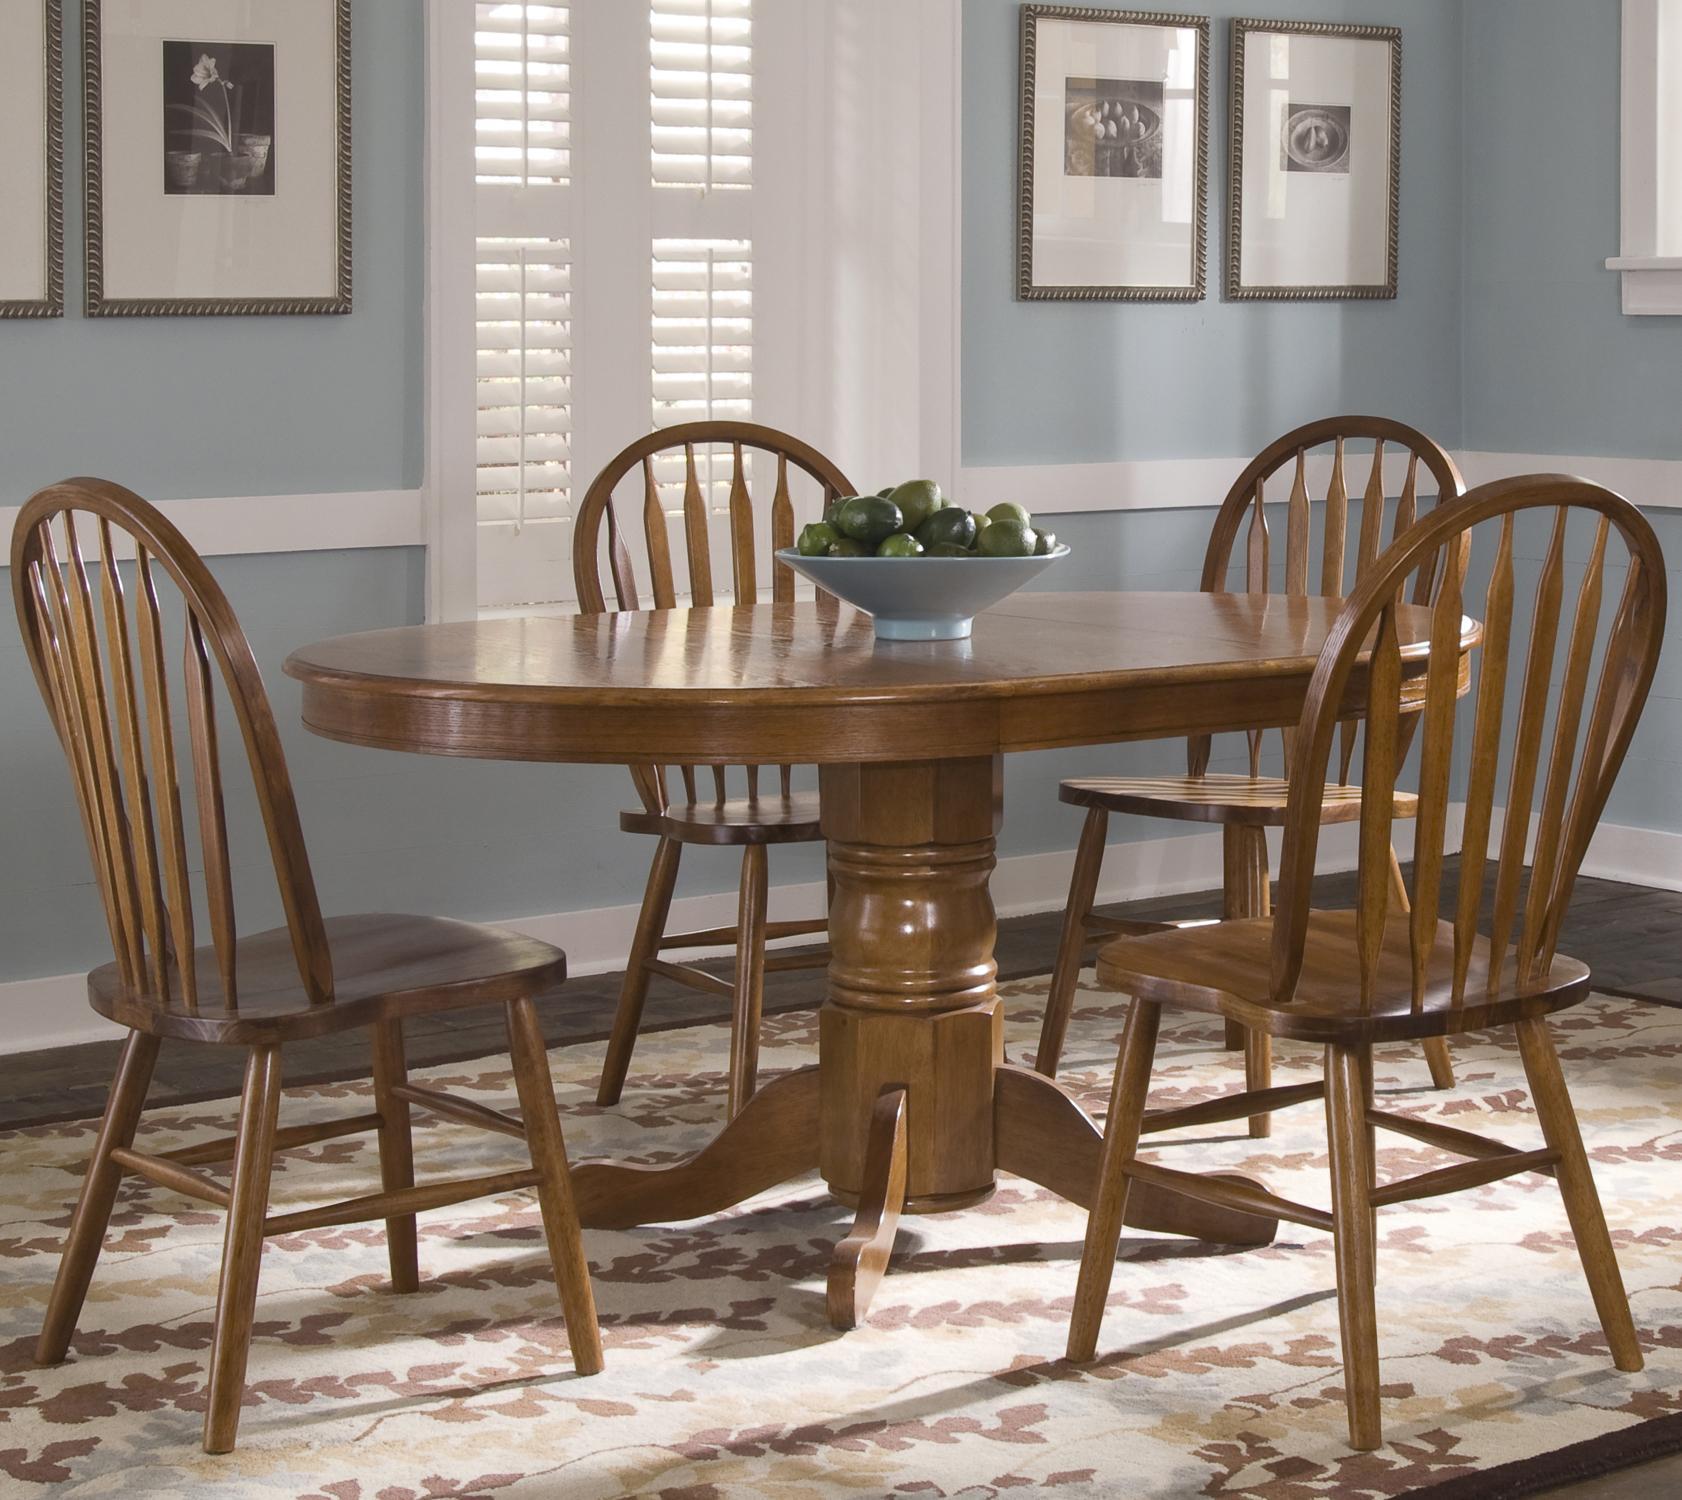 Liberty Furniture Nostalgia Oval Pedestal Dinner Table w/ 4 Windsor ...